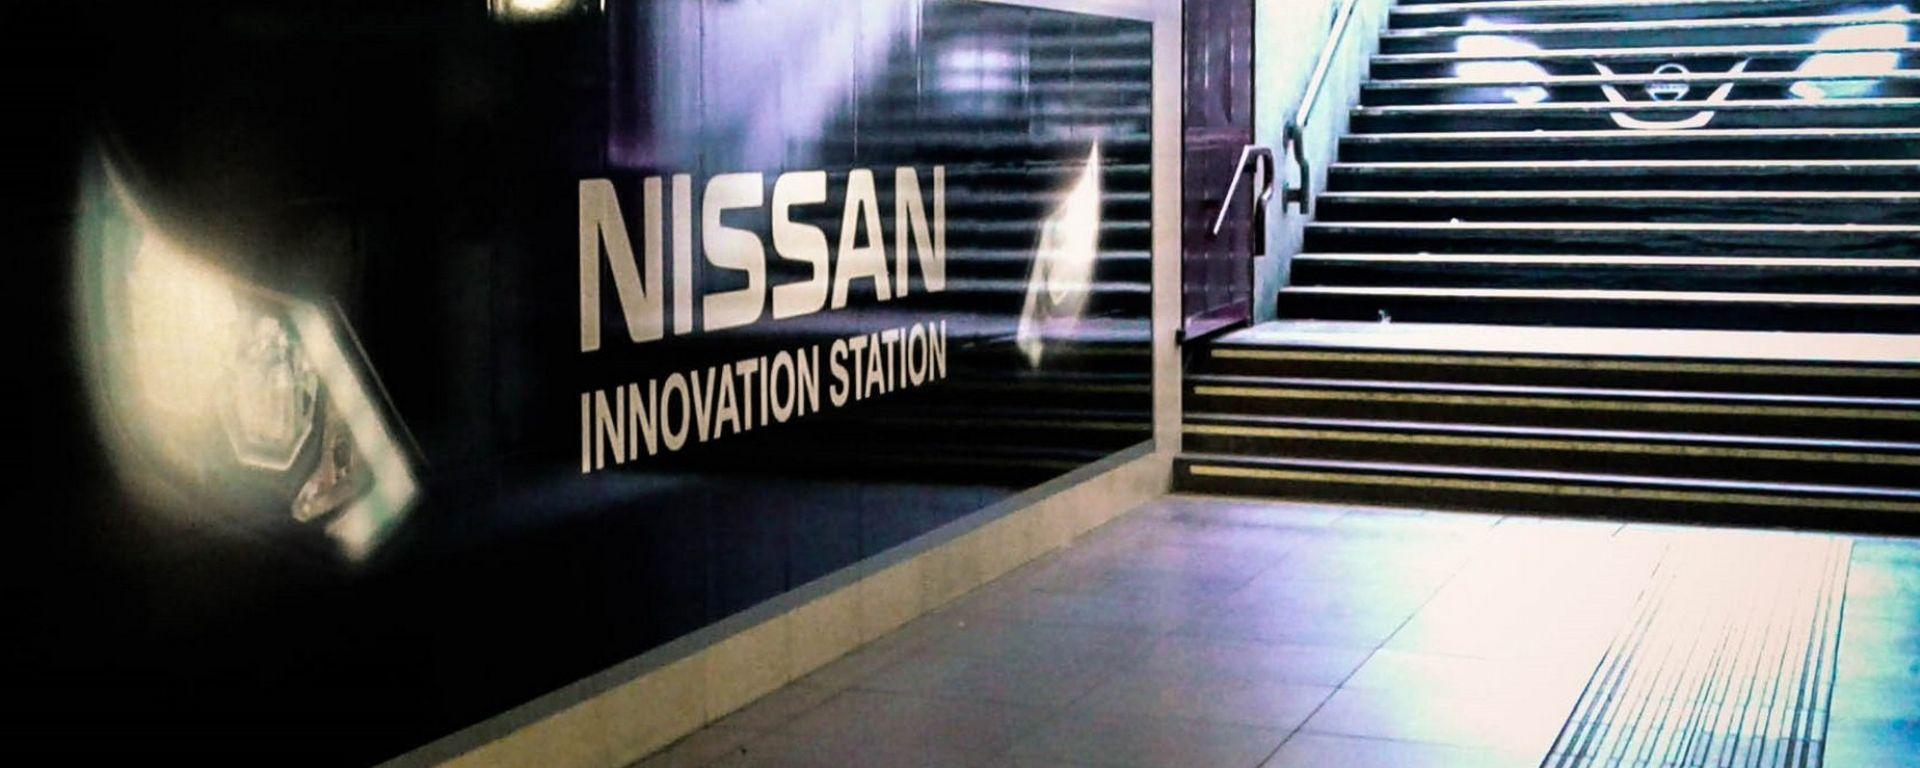 Nissan Innovation Station